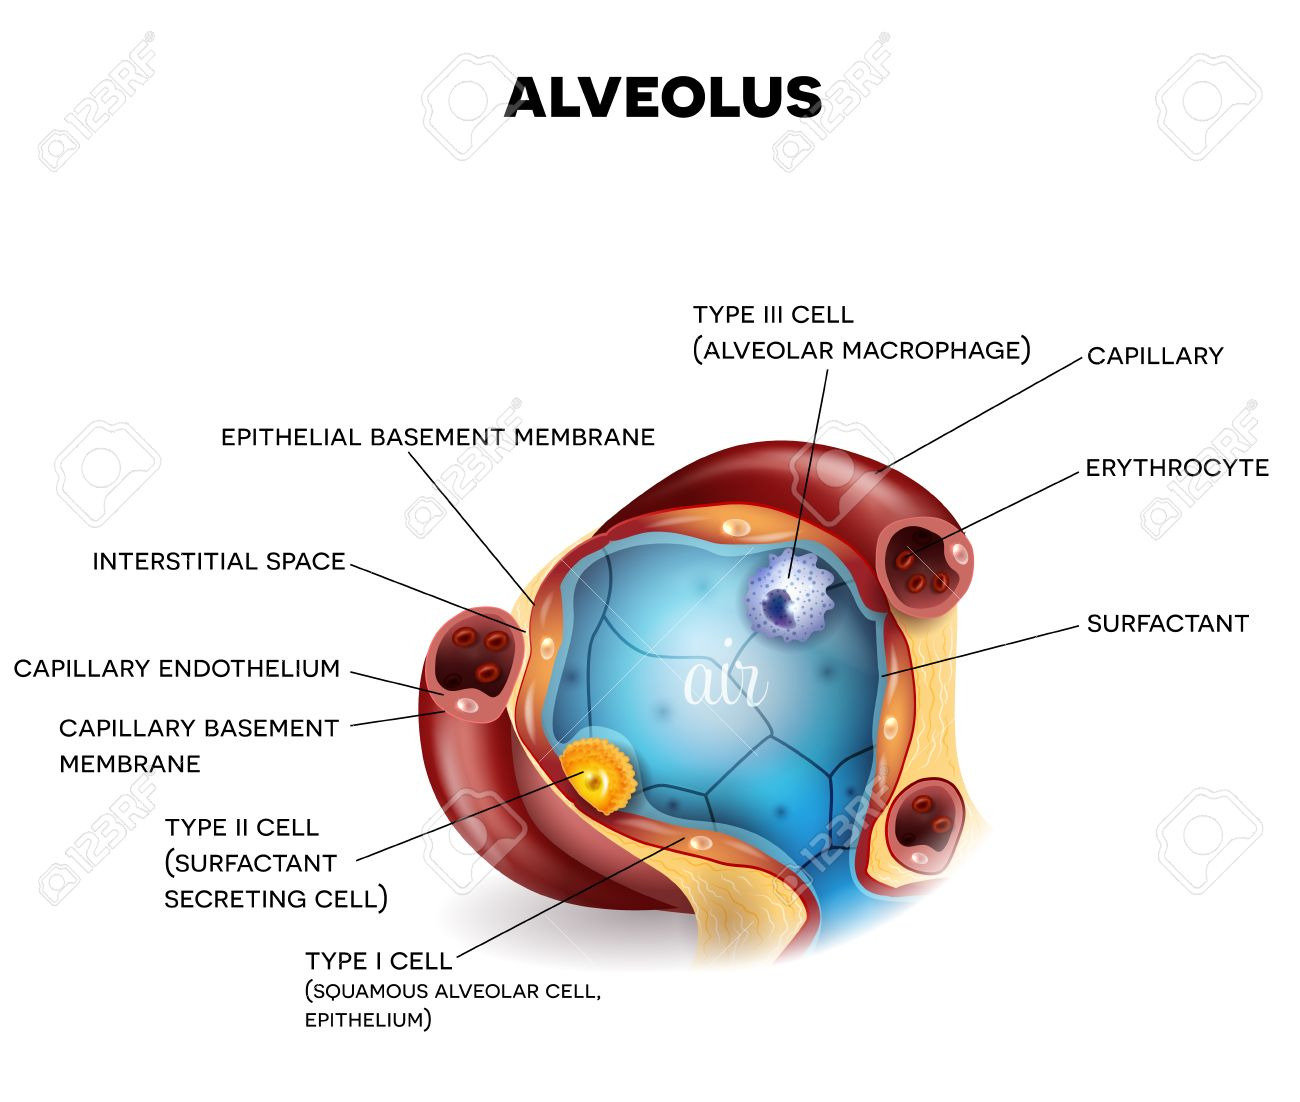 Anatomía De Cerca Alvéolo, Tres Tipos De Células Alveolares ...